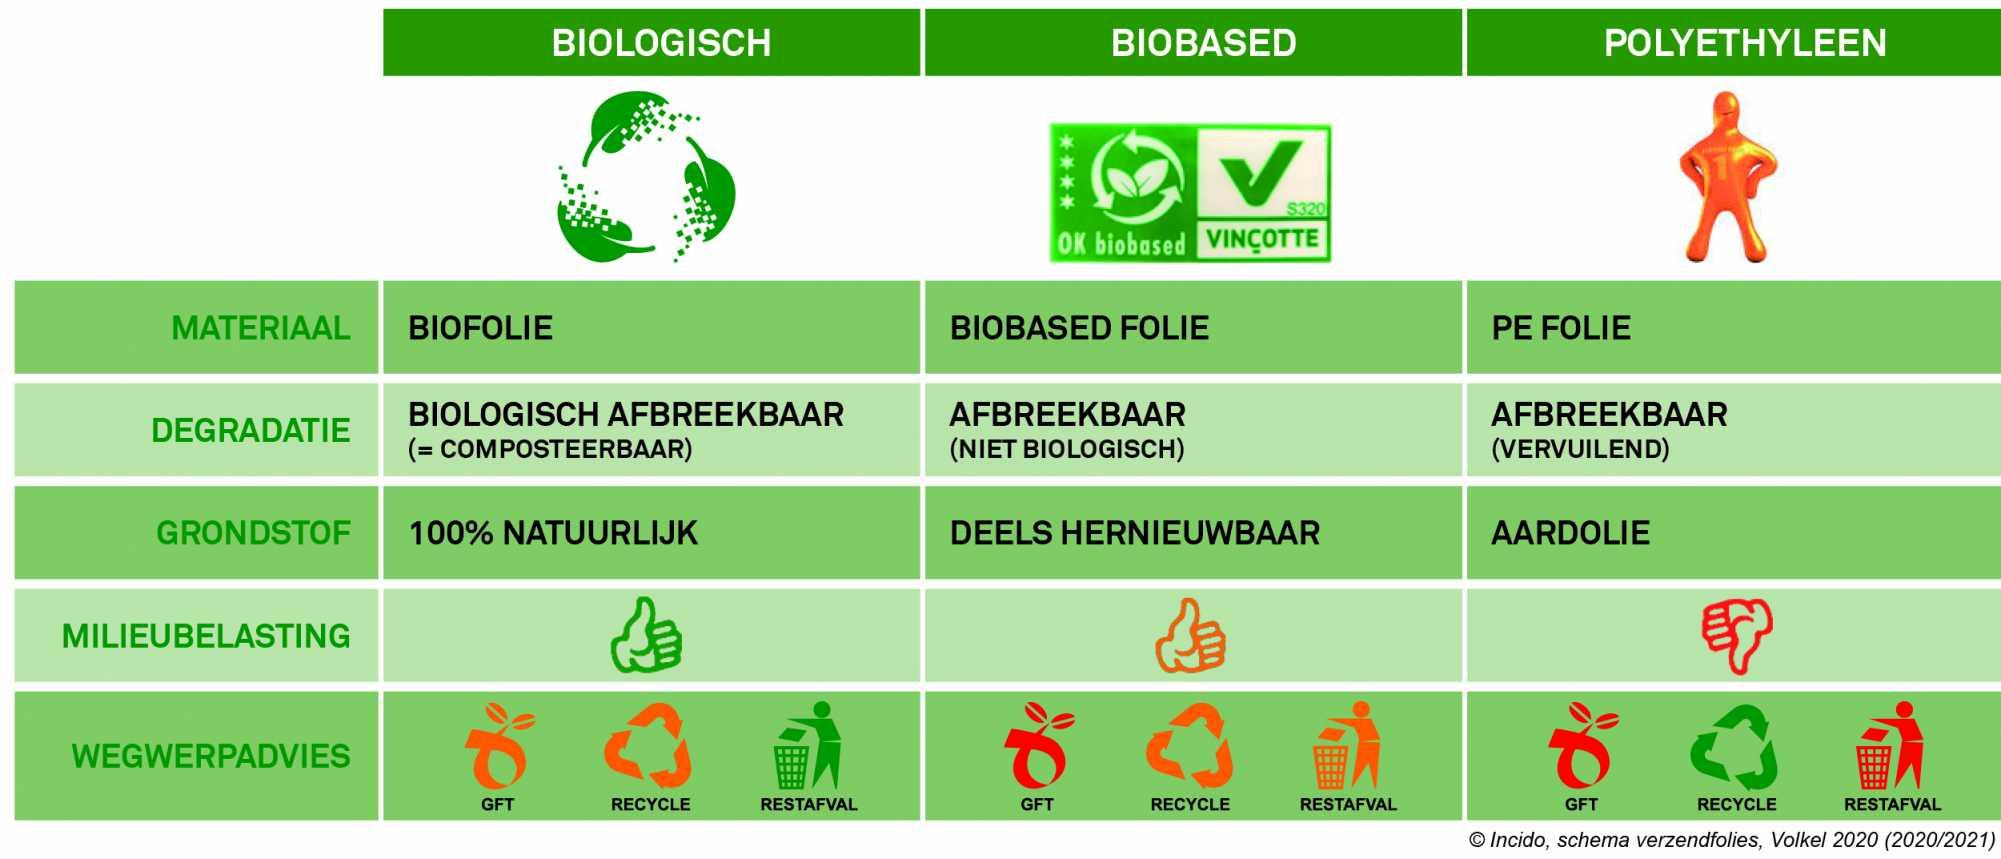 tabel verzendfolies biofolie